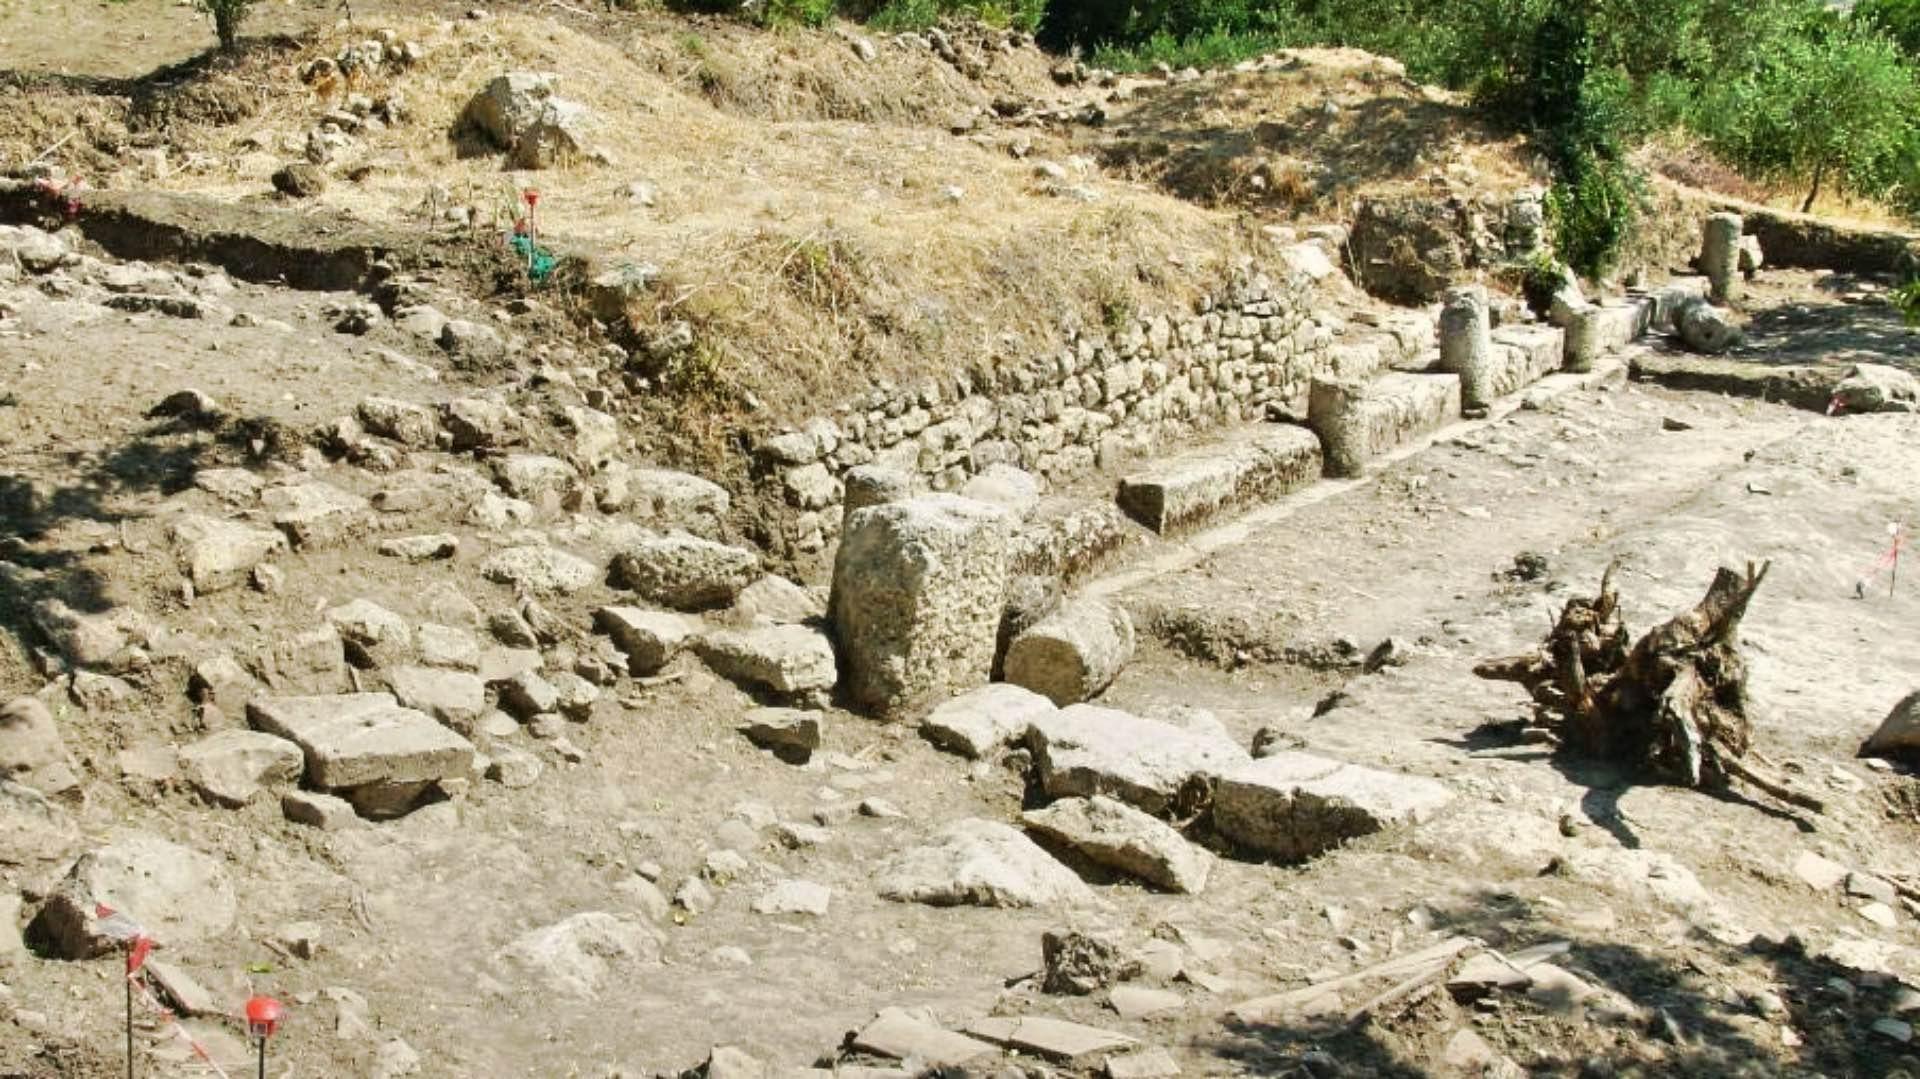 villa-romana-di-petralia-soprana-1629357059.jpg